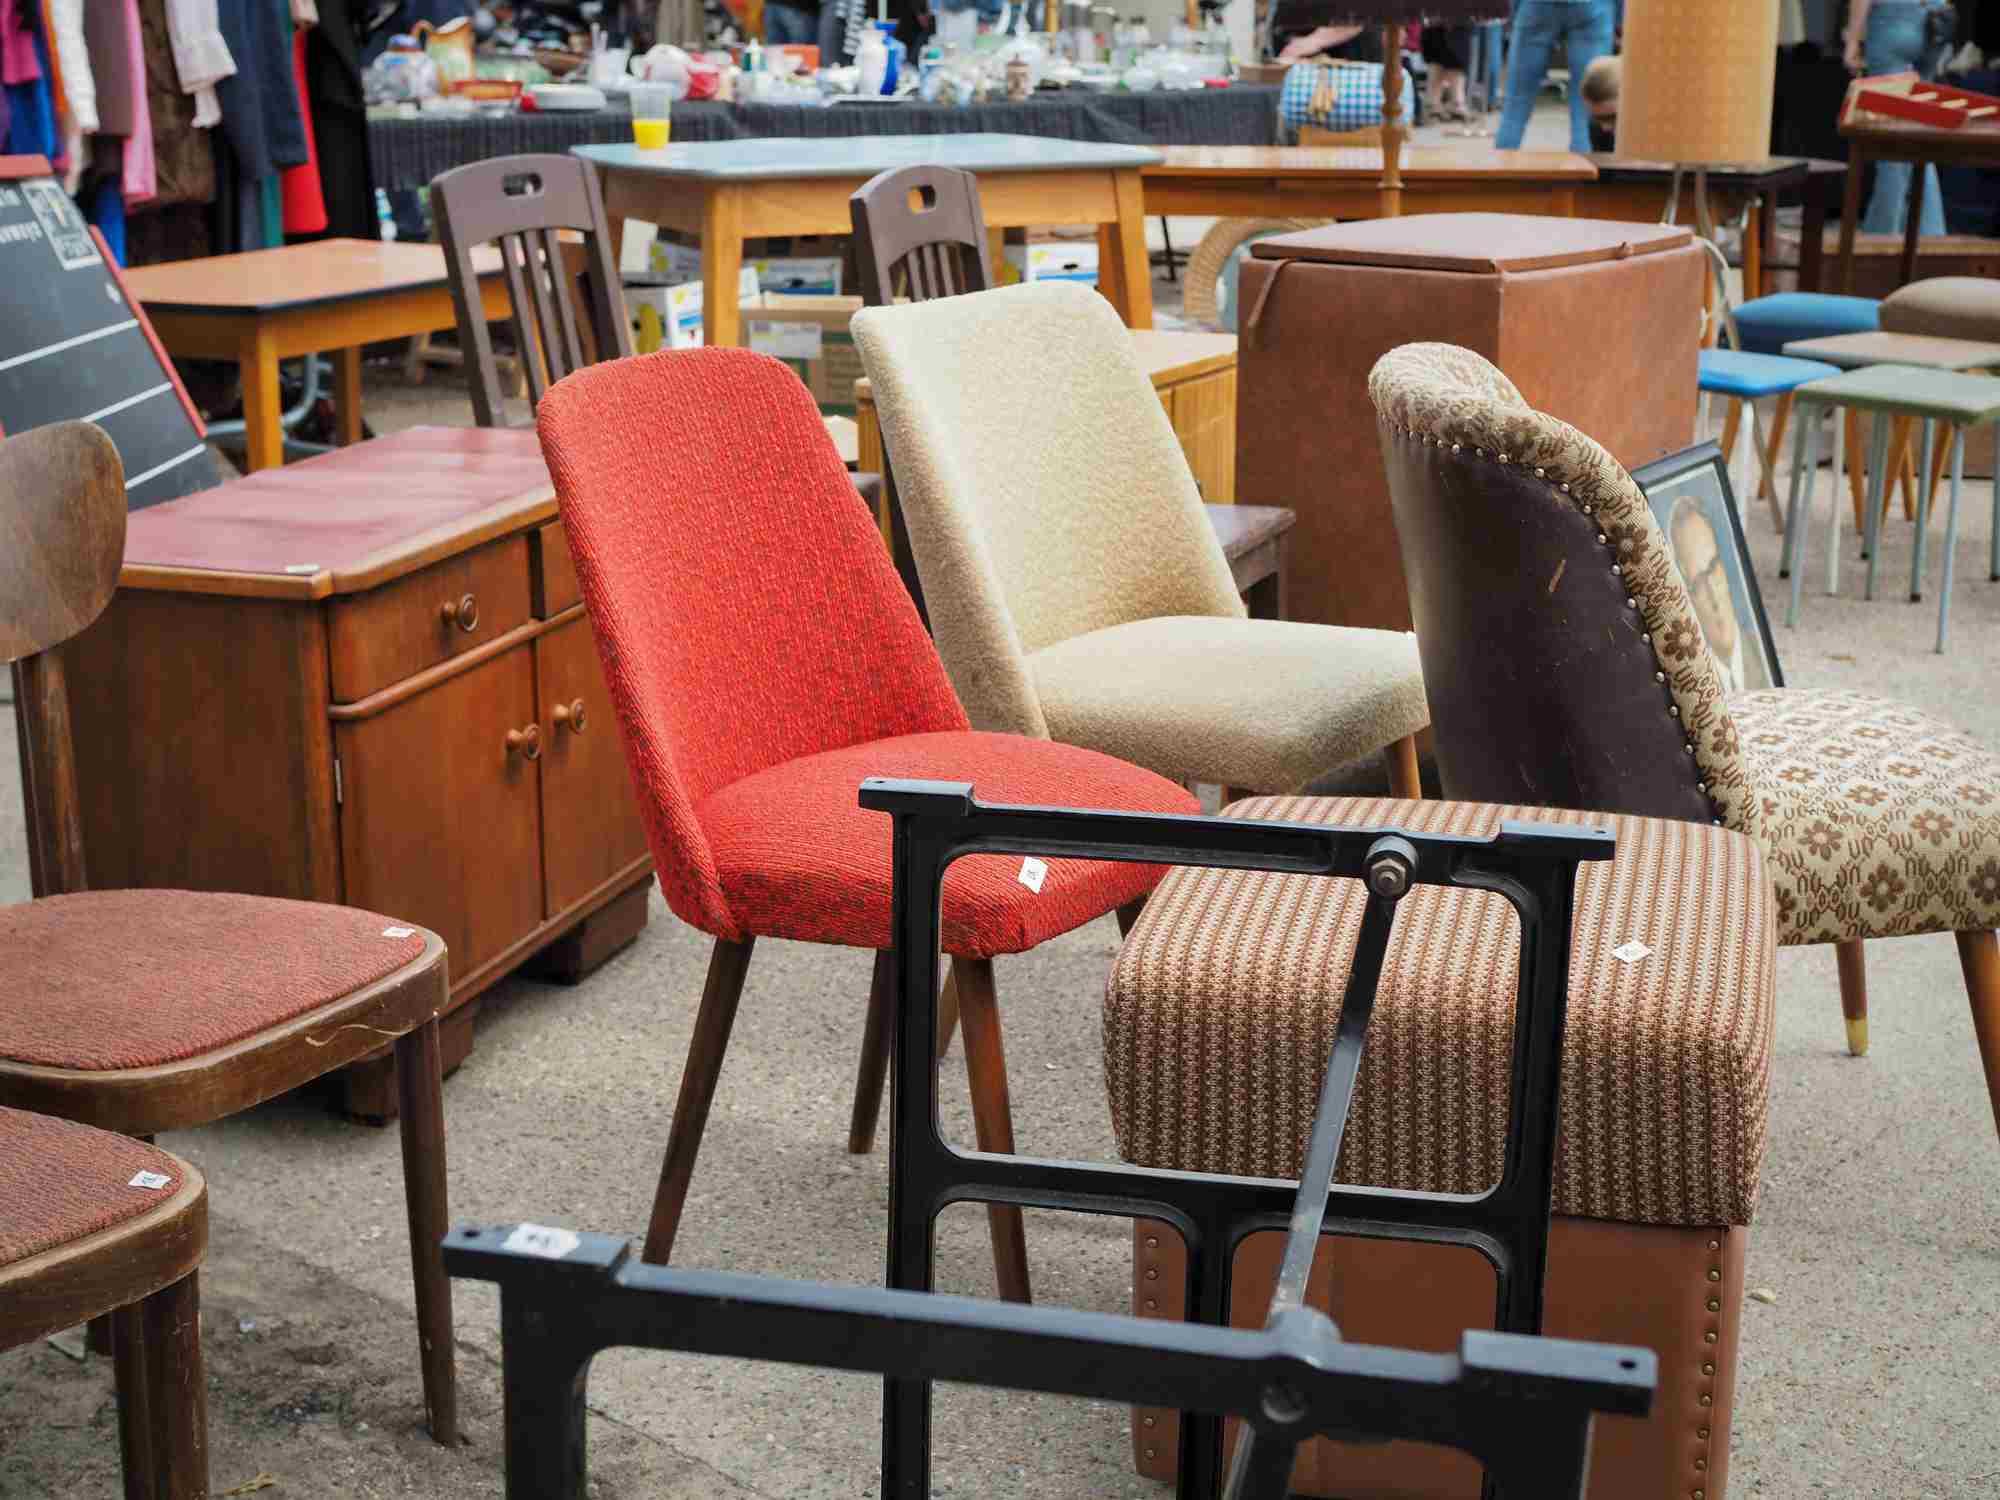 Furniture for Sale at a Flea Market